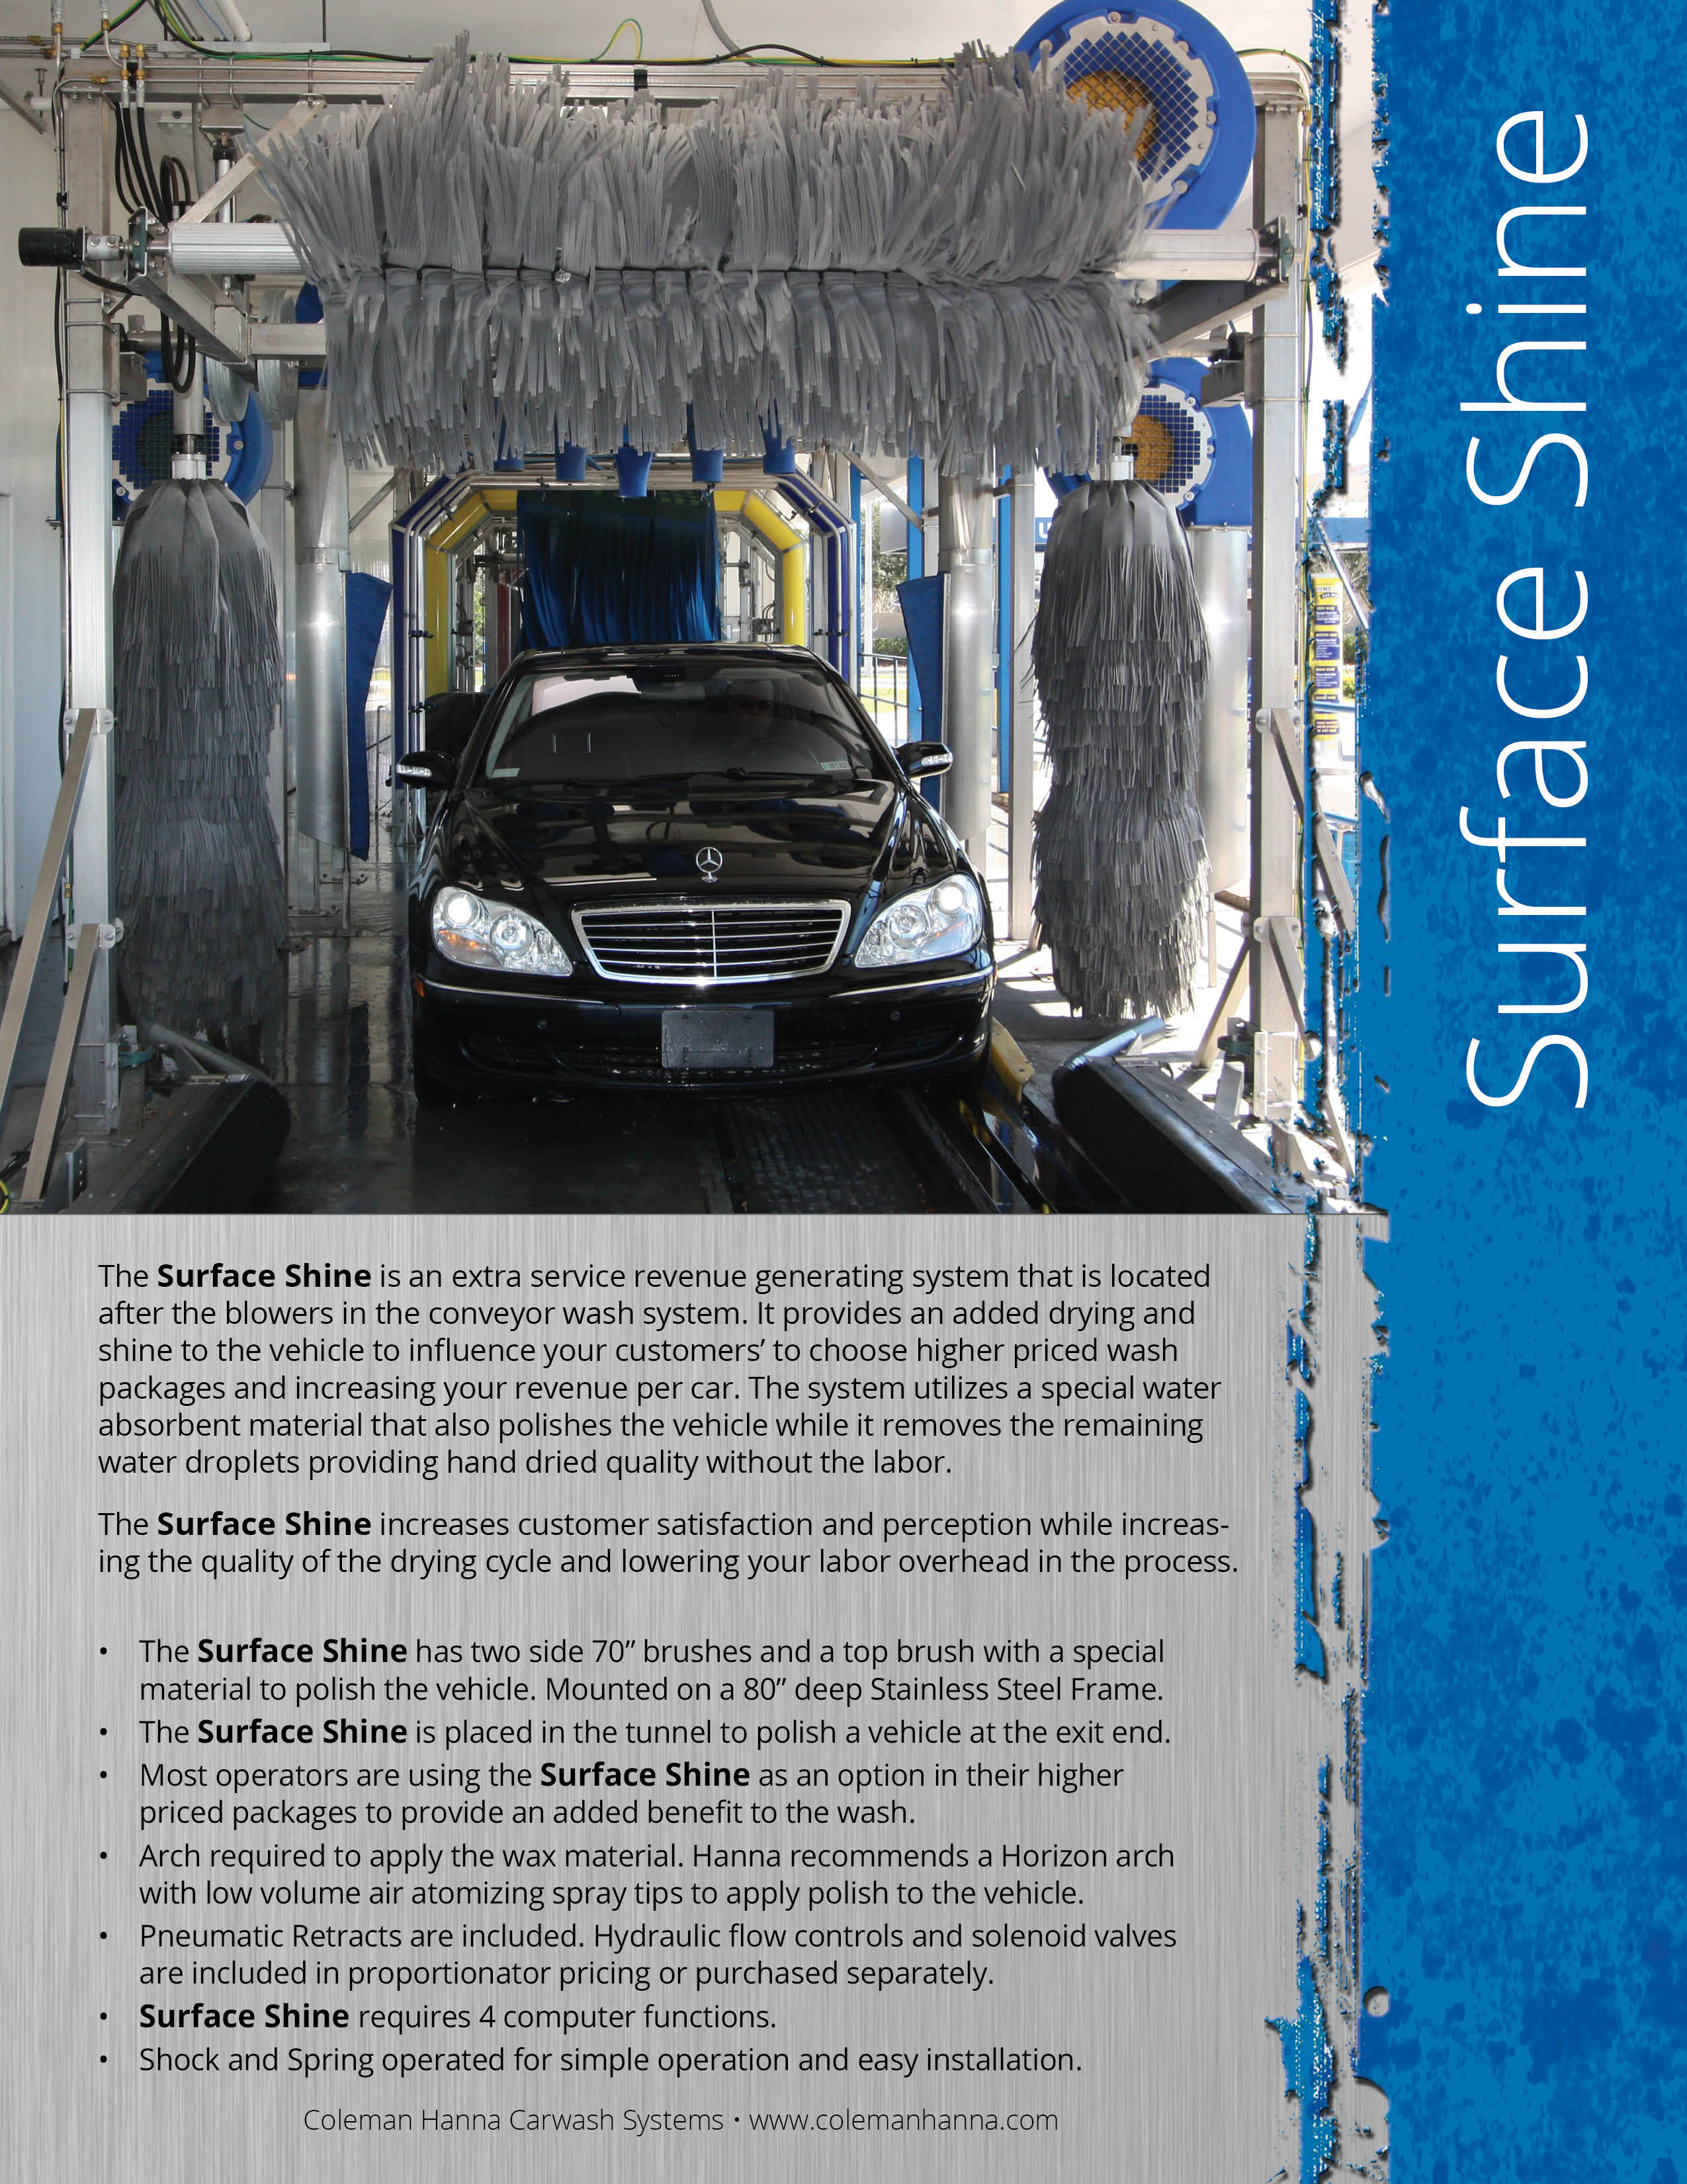 SurfaceShine&GleamMachine